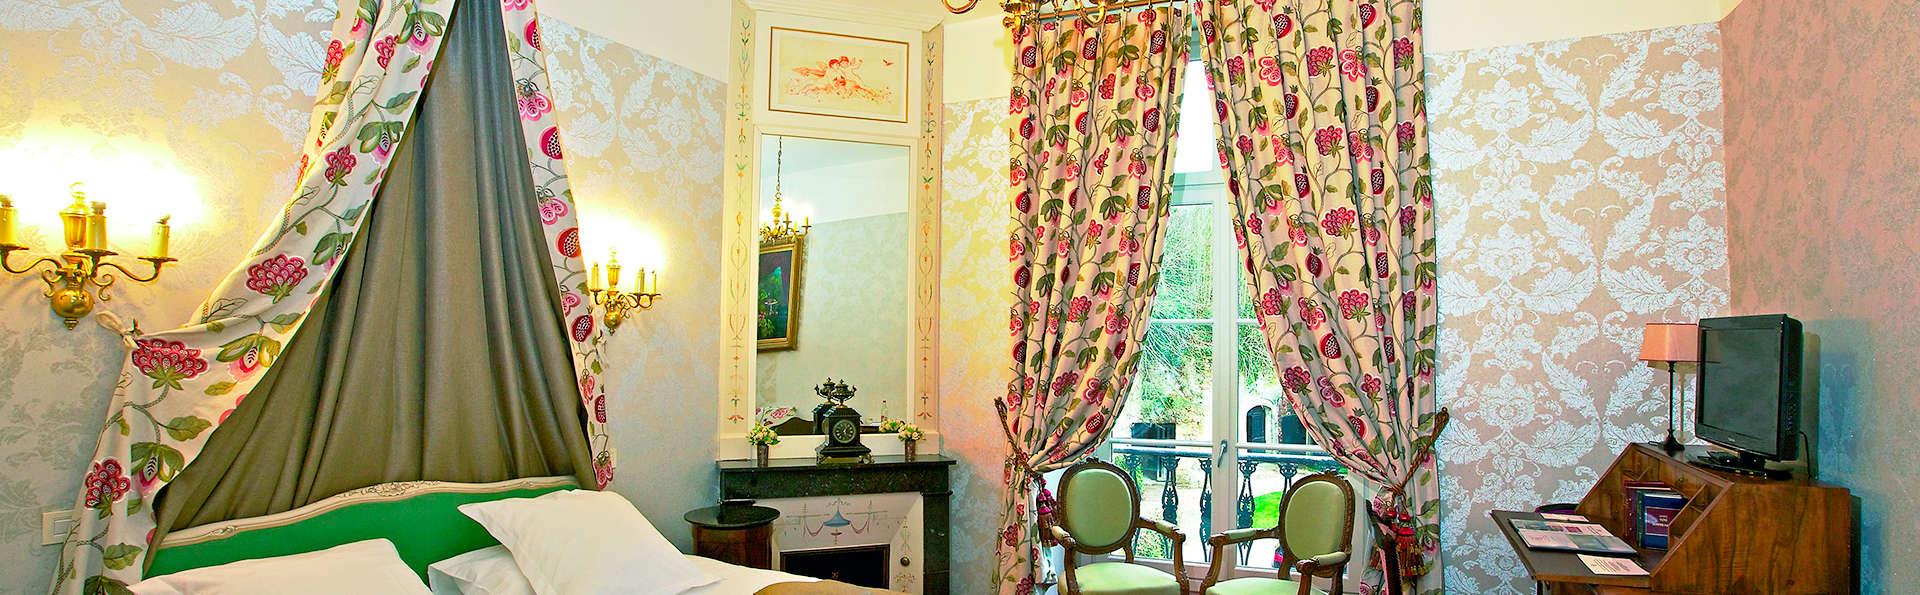 Château de Pray - EDIT_room.jpg